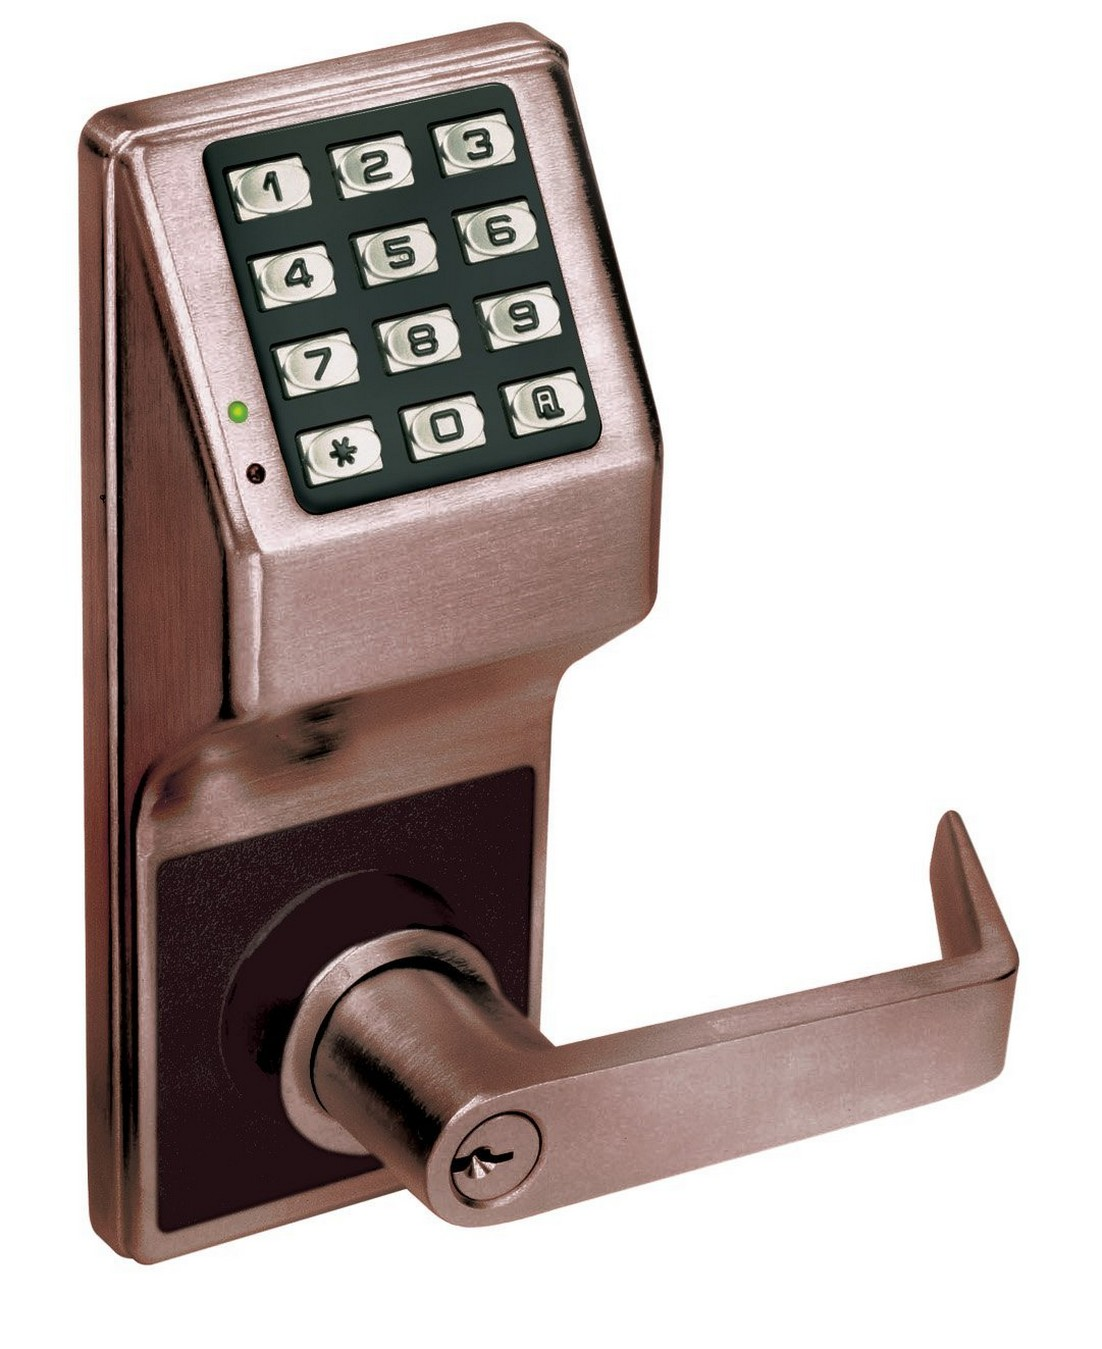 alarm lock dl2700 10b duronodic trilogy t2 trilogy t2 100 user standalone electronic digital. Black Bedroom Furniture Sets. Home Design Ideas